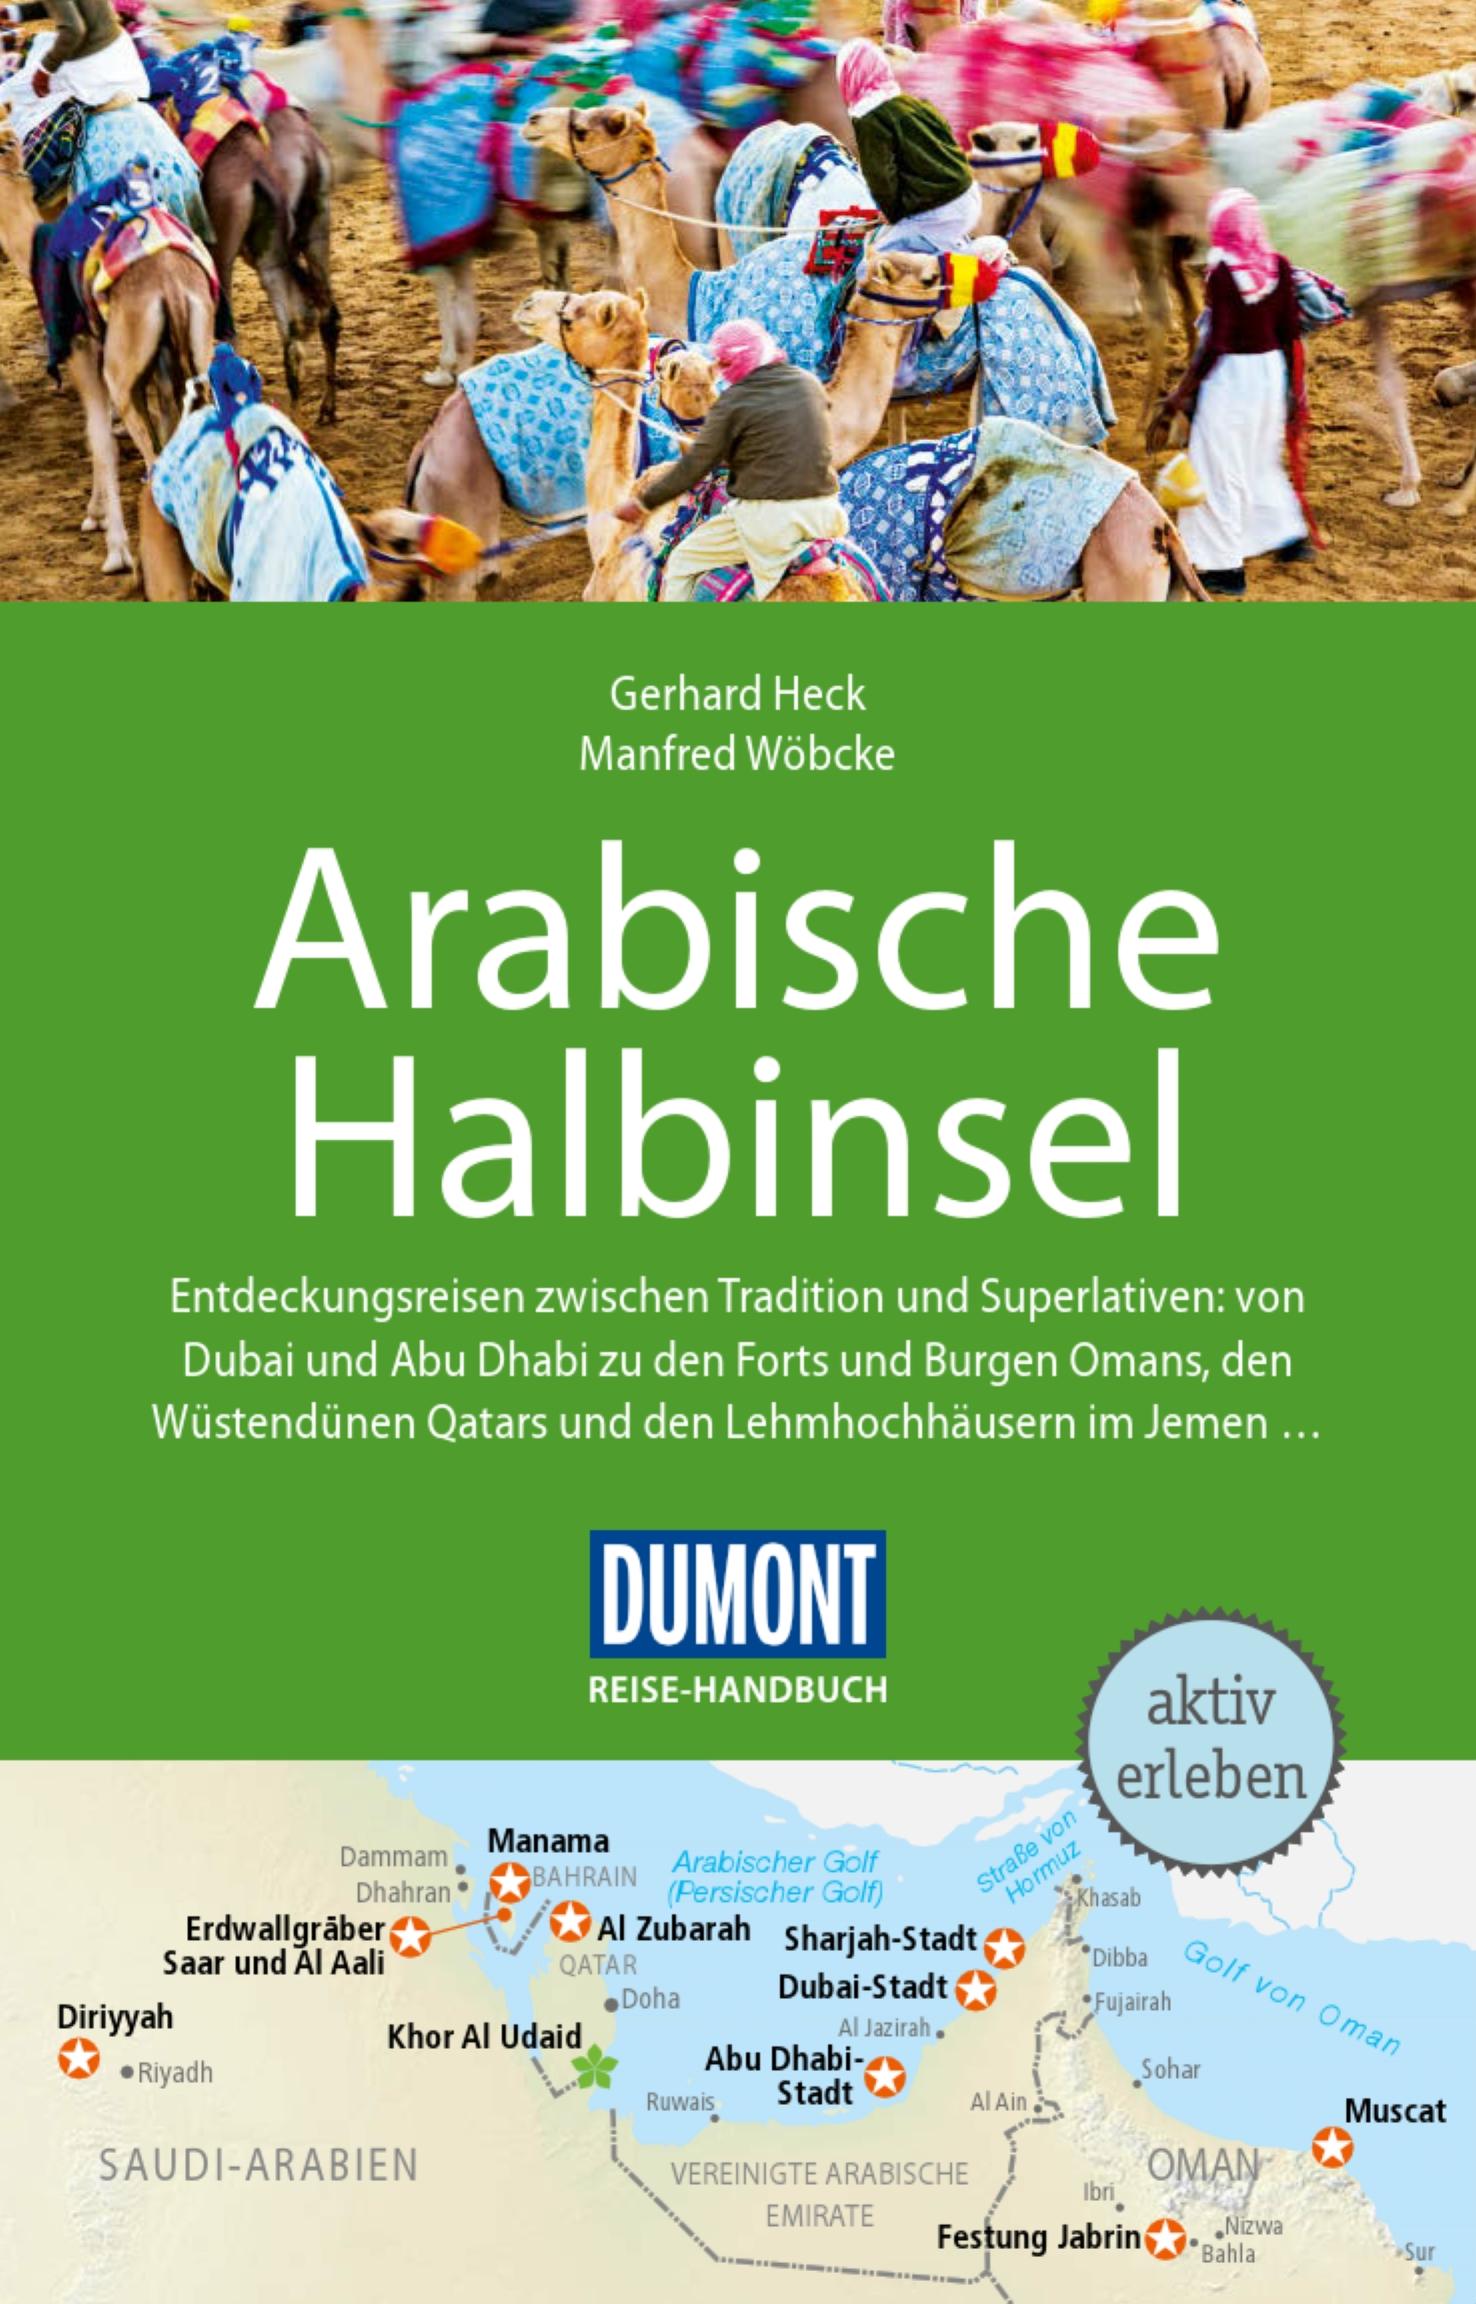 DuMont Reise-Handbuch - Arabische Halbinsel (Cover)